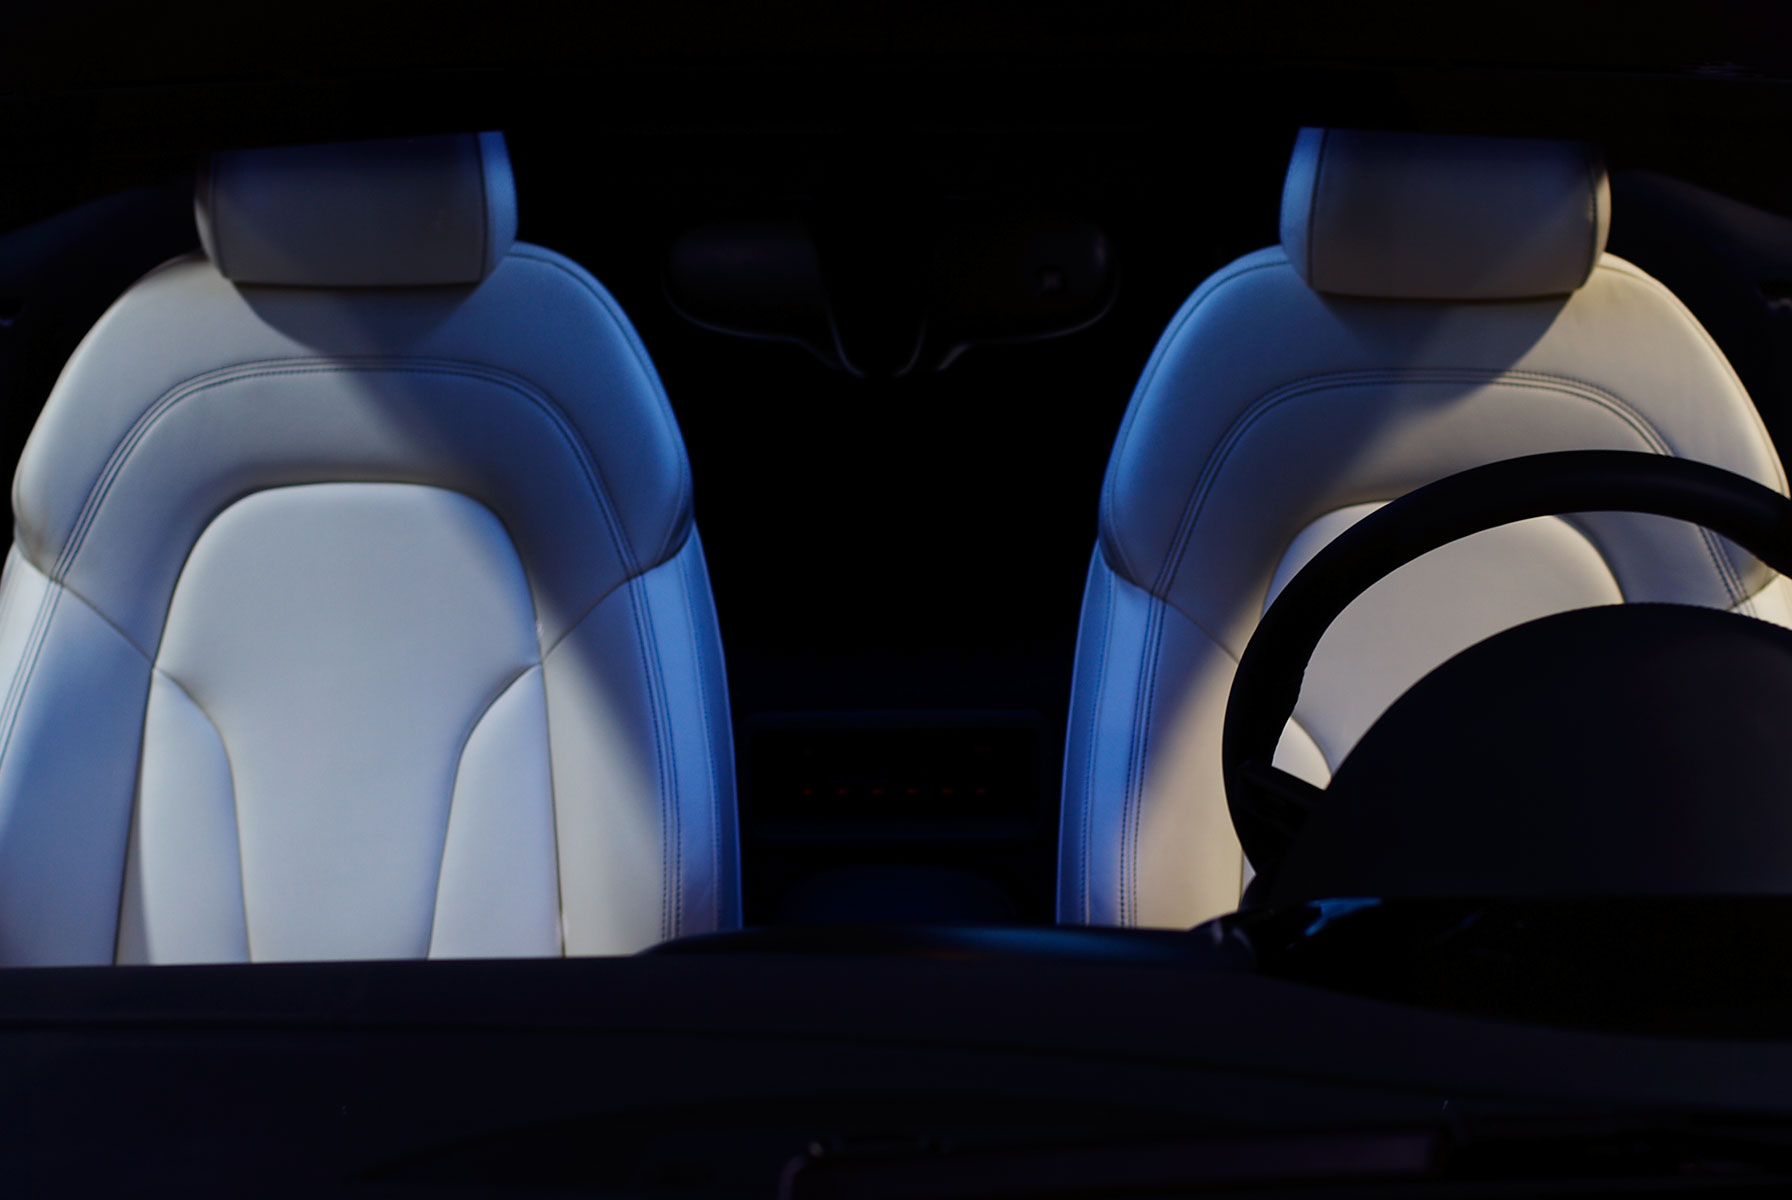 Automobil-Messefotografie